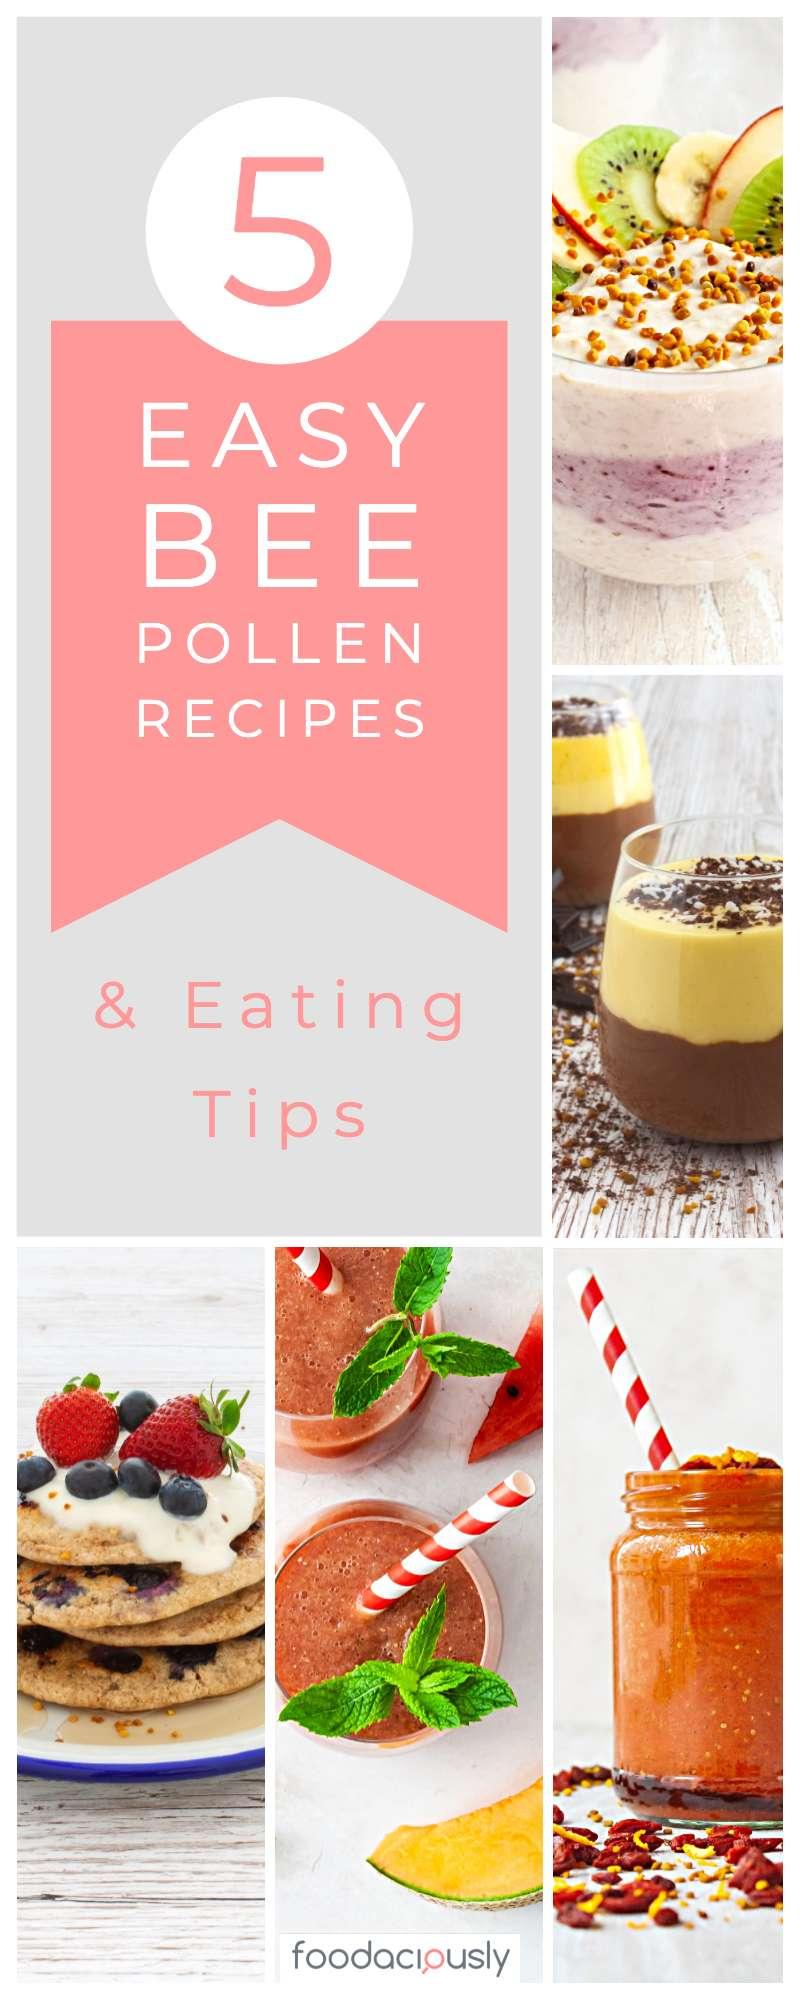 5 Easy Bee Pollen Recipes